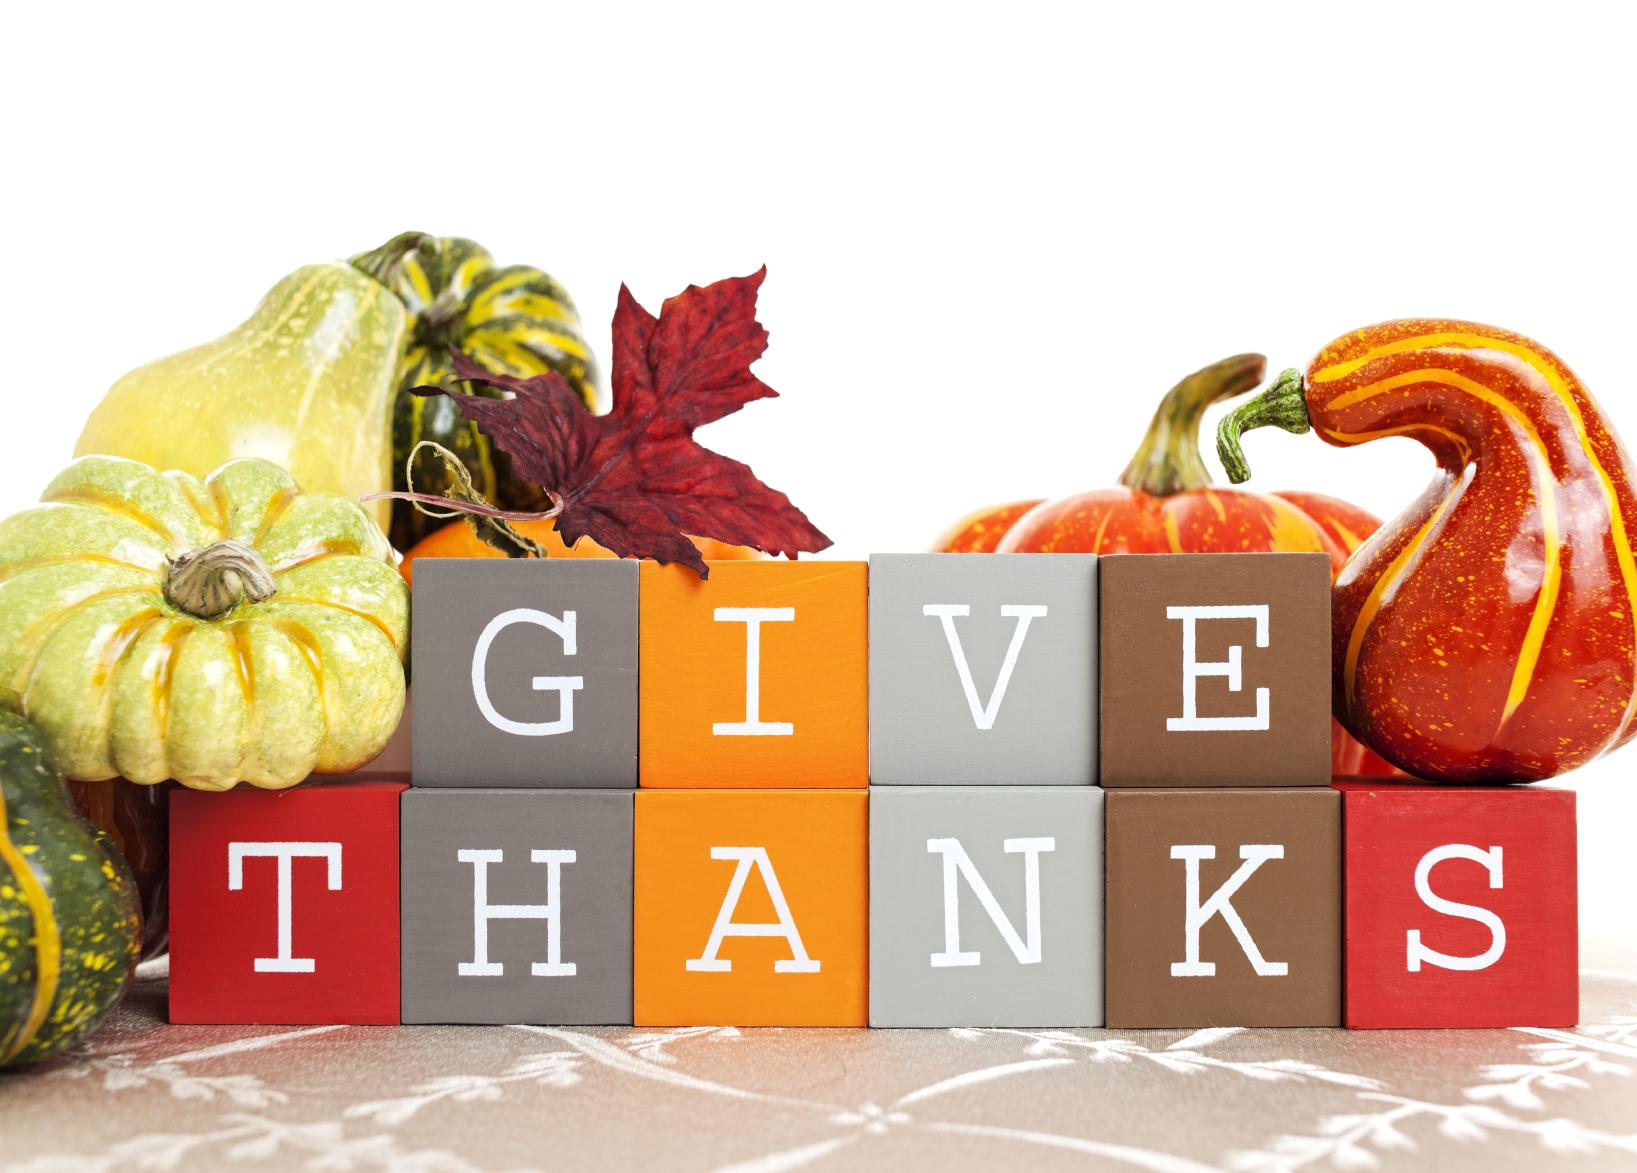 ThanksgivingBP_Image_Draft_1.jpg